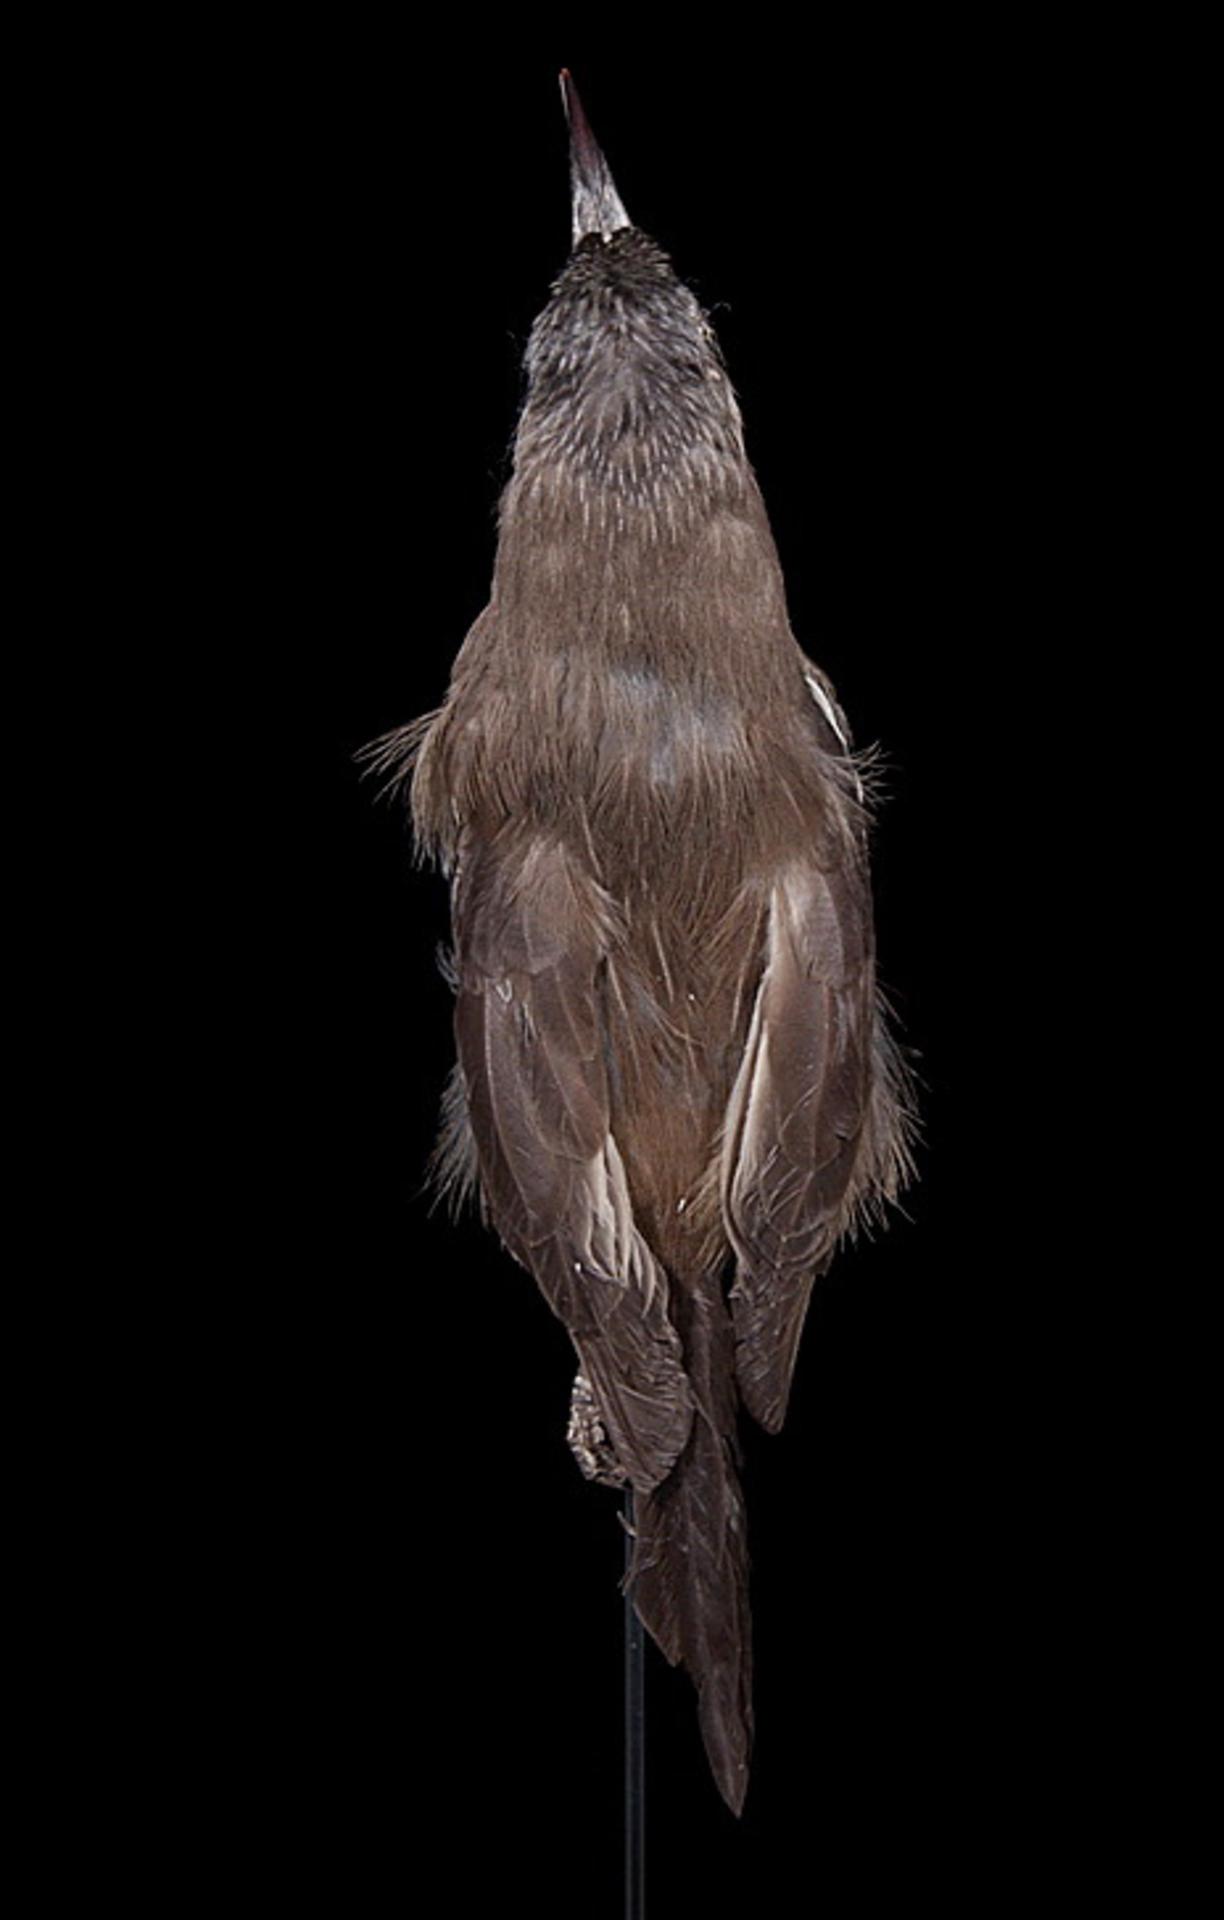 RMNH.AVES.110029   Moho braccatus Cassin, 1858